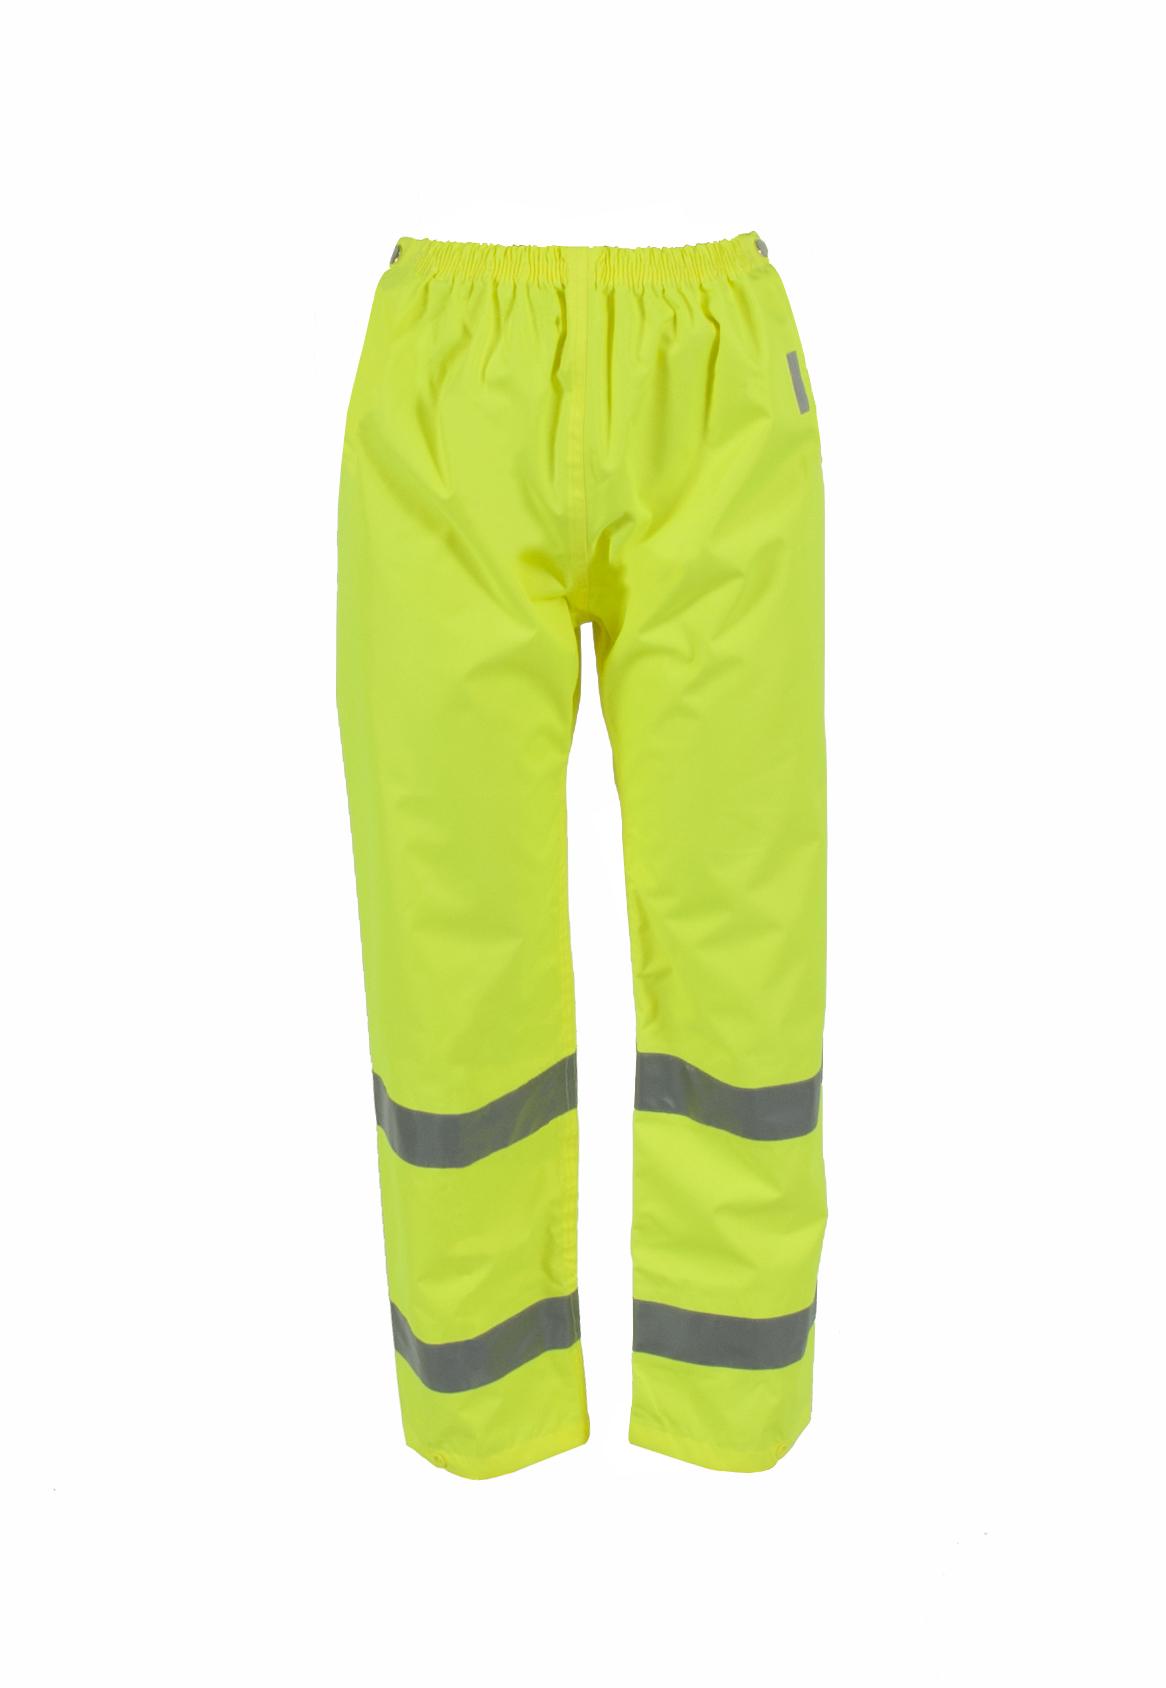 Neese Air Tex High Visibility Trousers| 9100ET-Neese